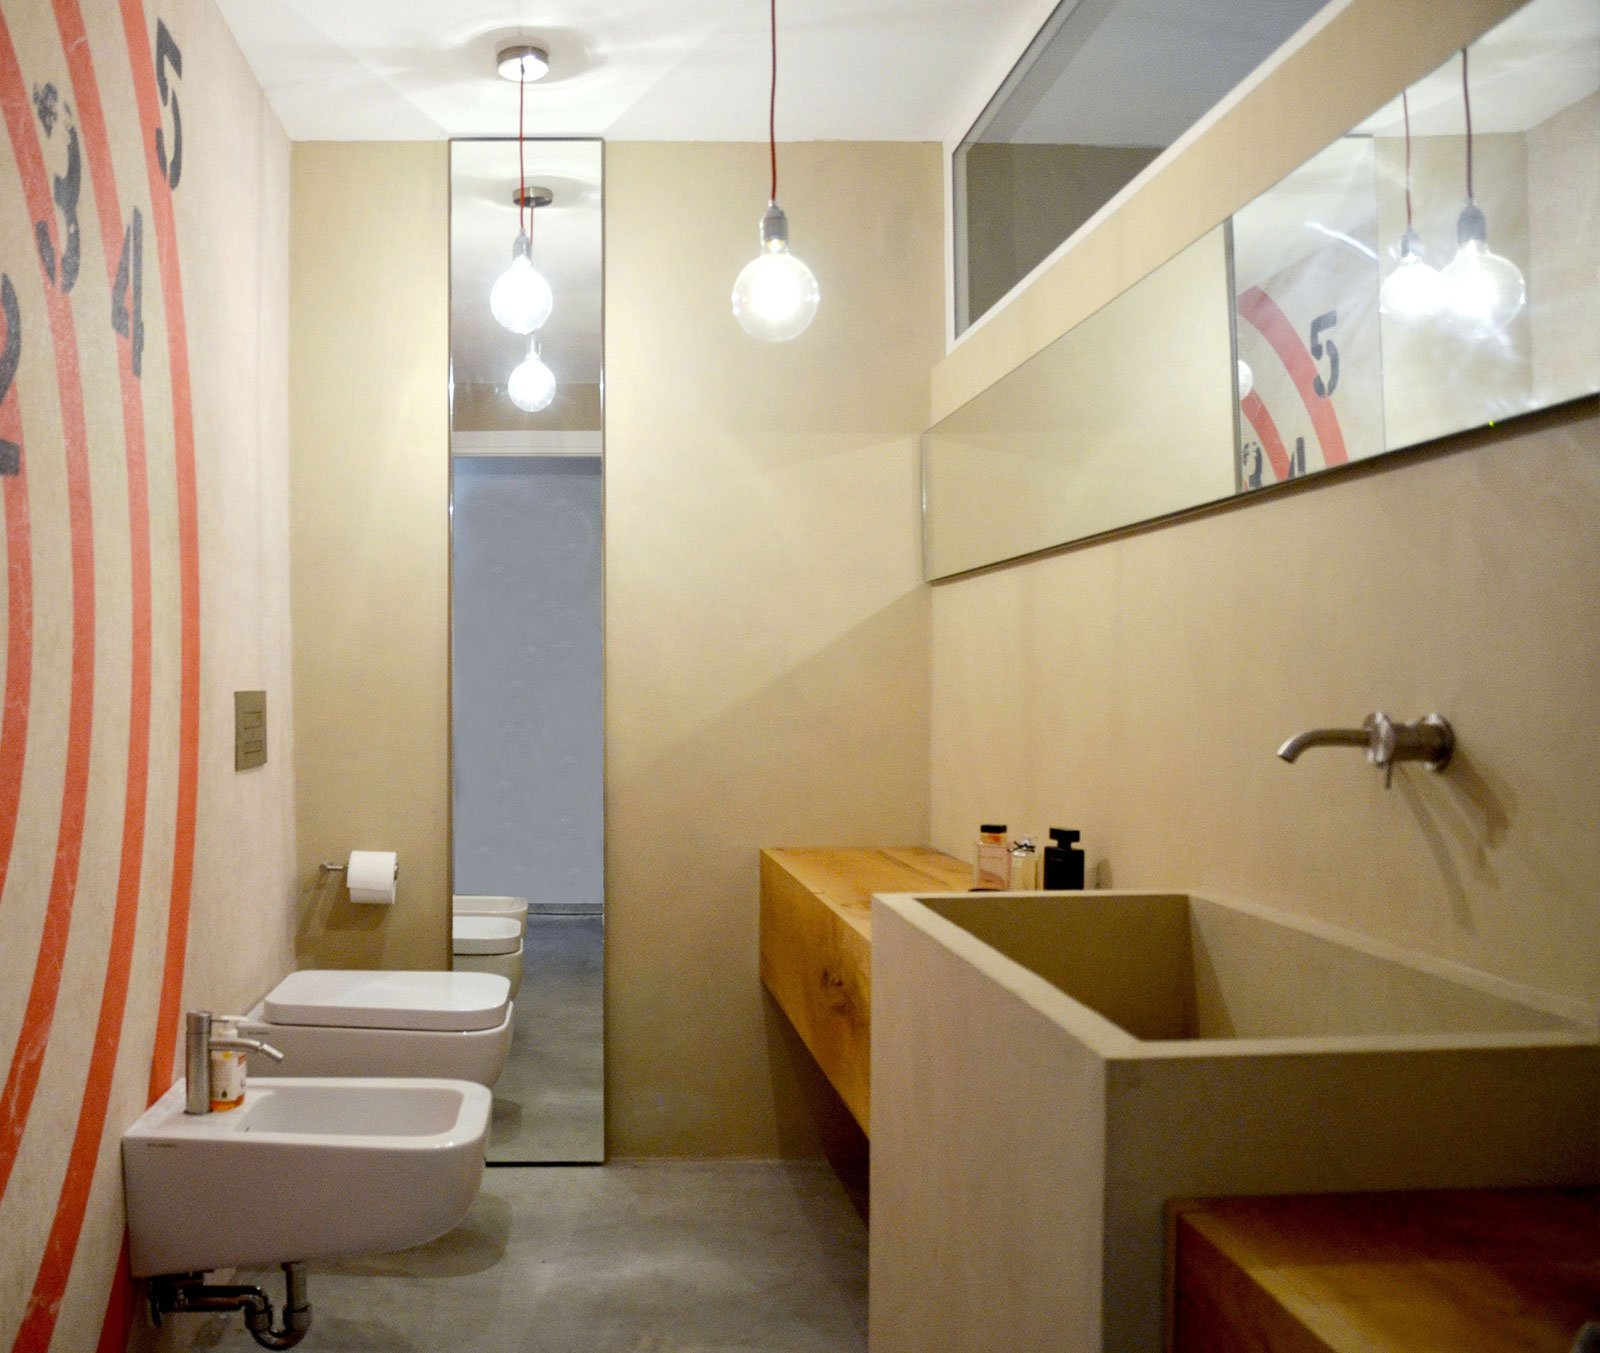 Resina rivestimenti per pavimenti pareti piani di - Pavimenti in resina bagno ...